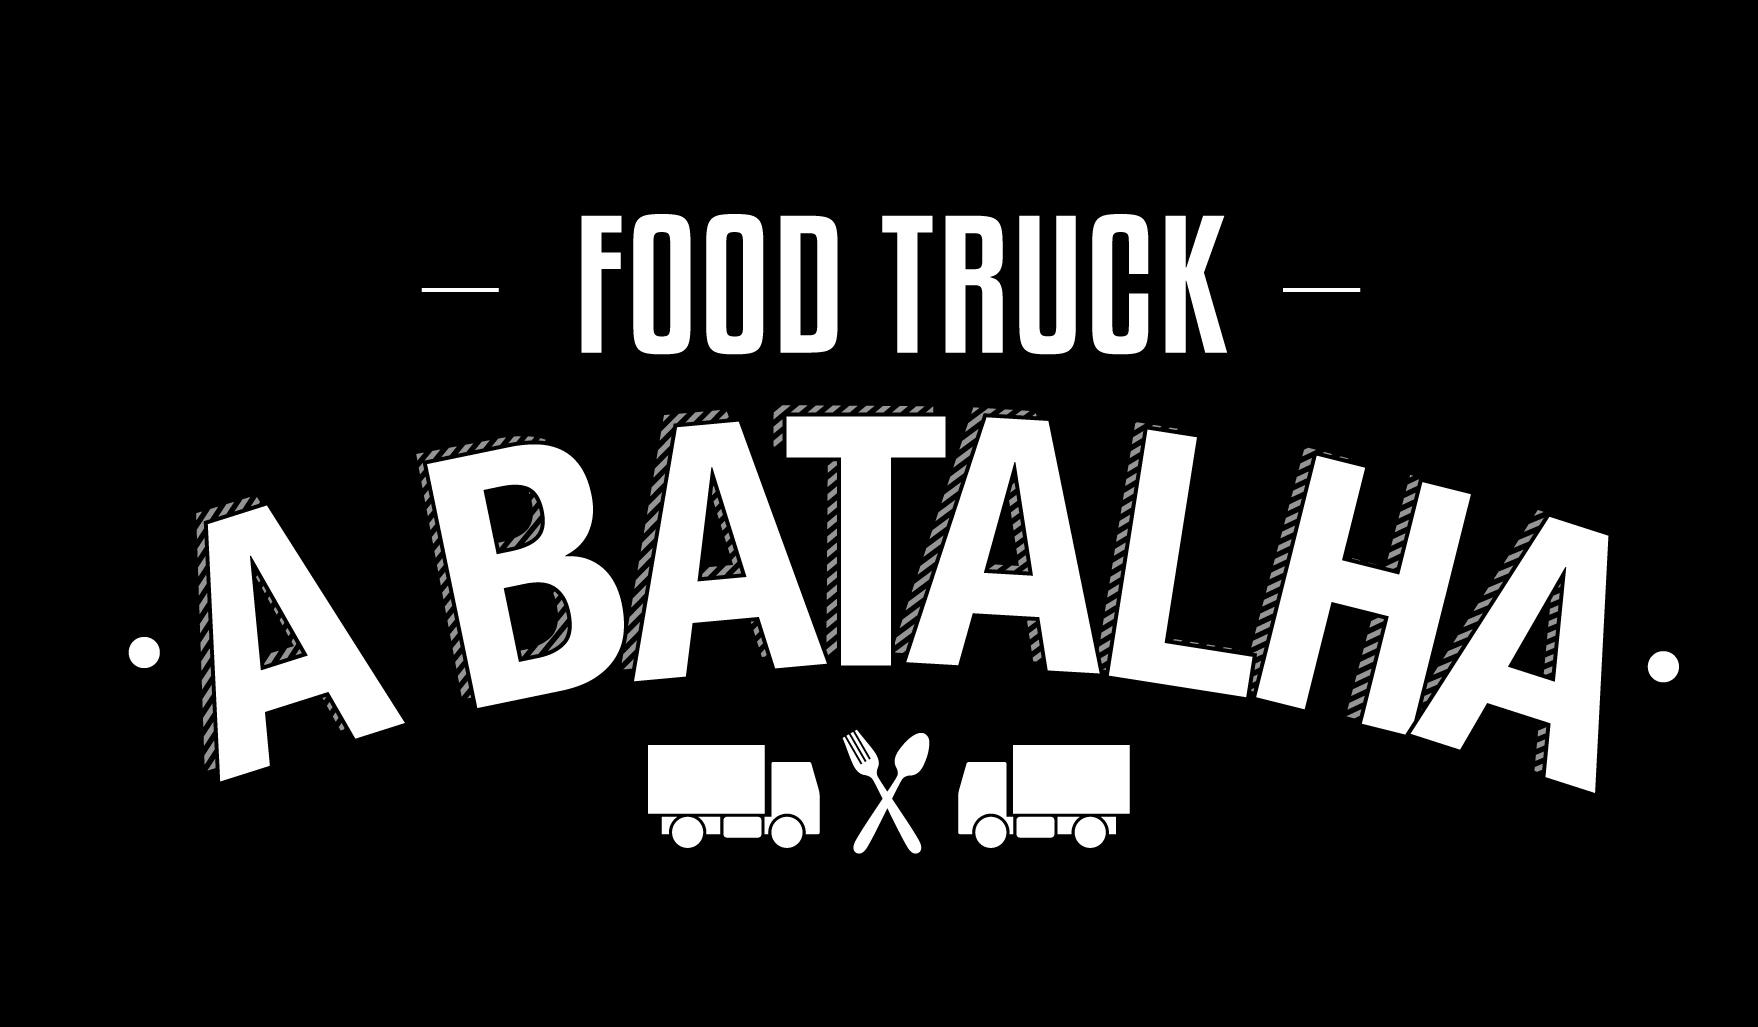 Food Truck A Batalha